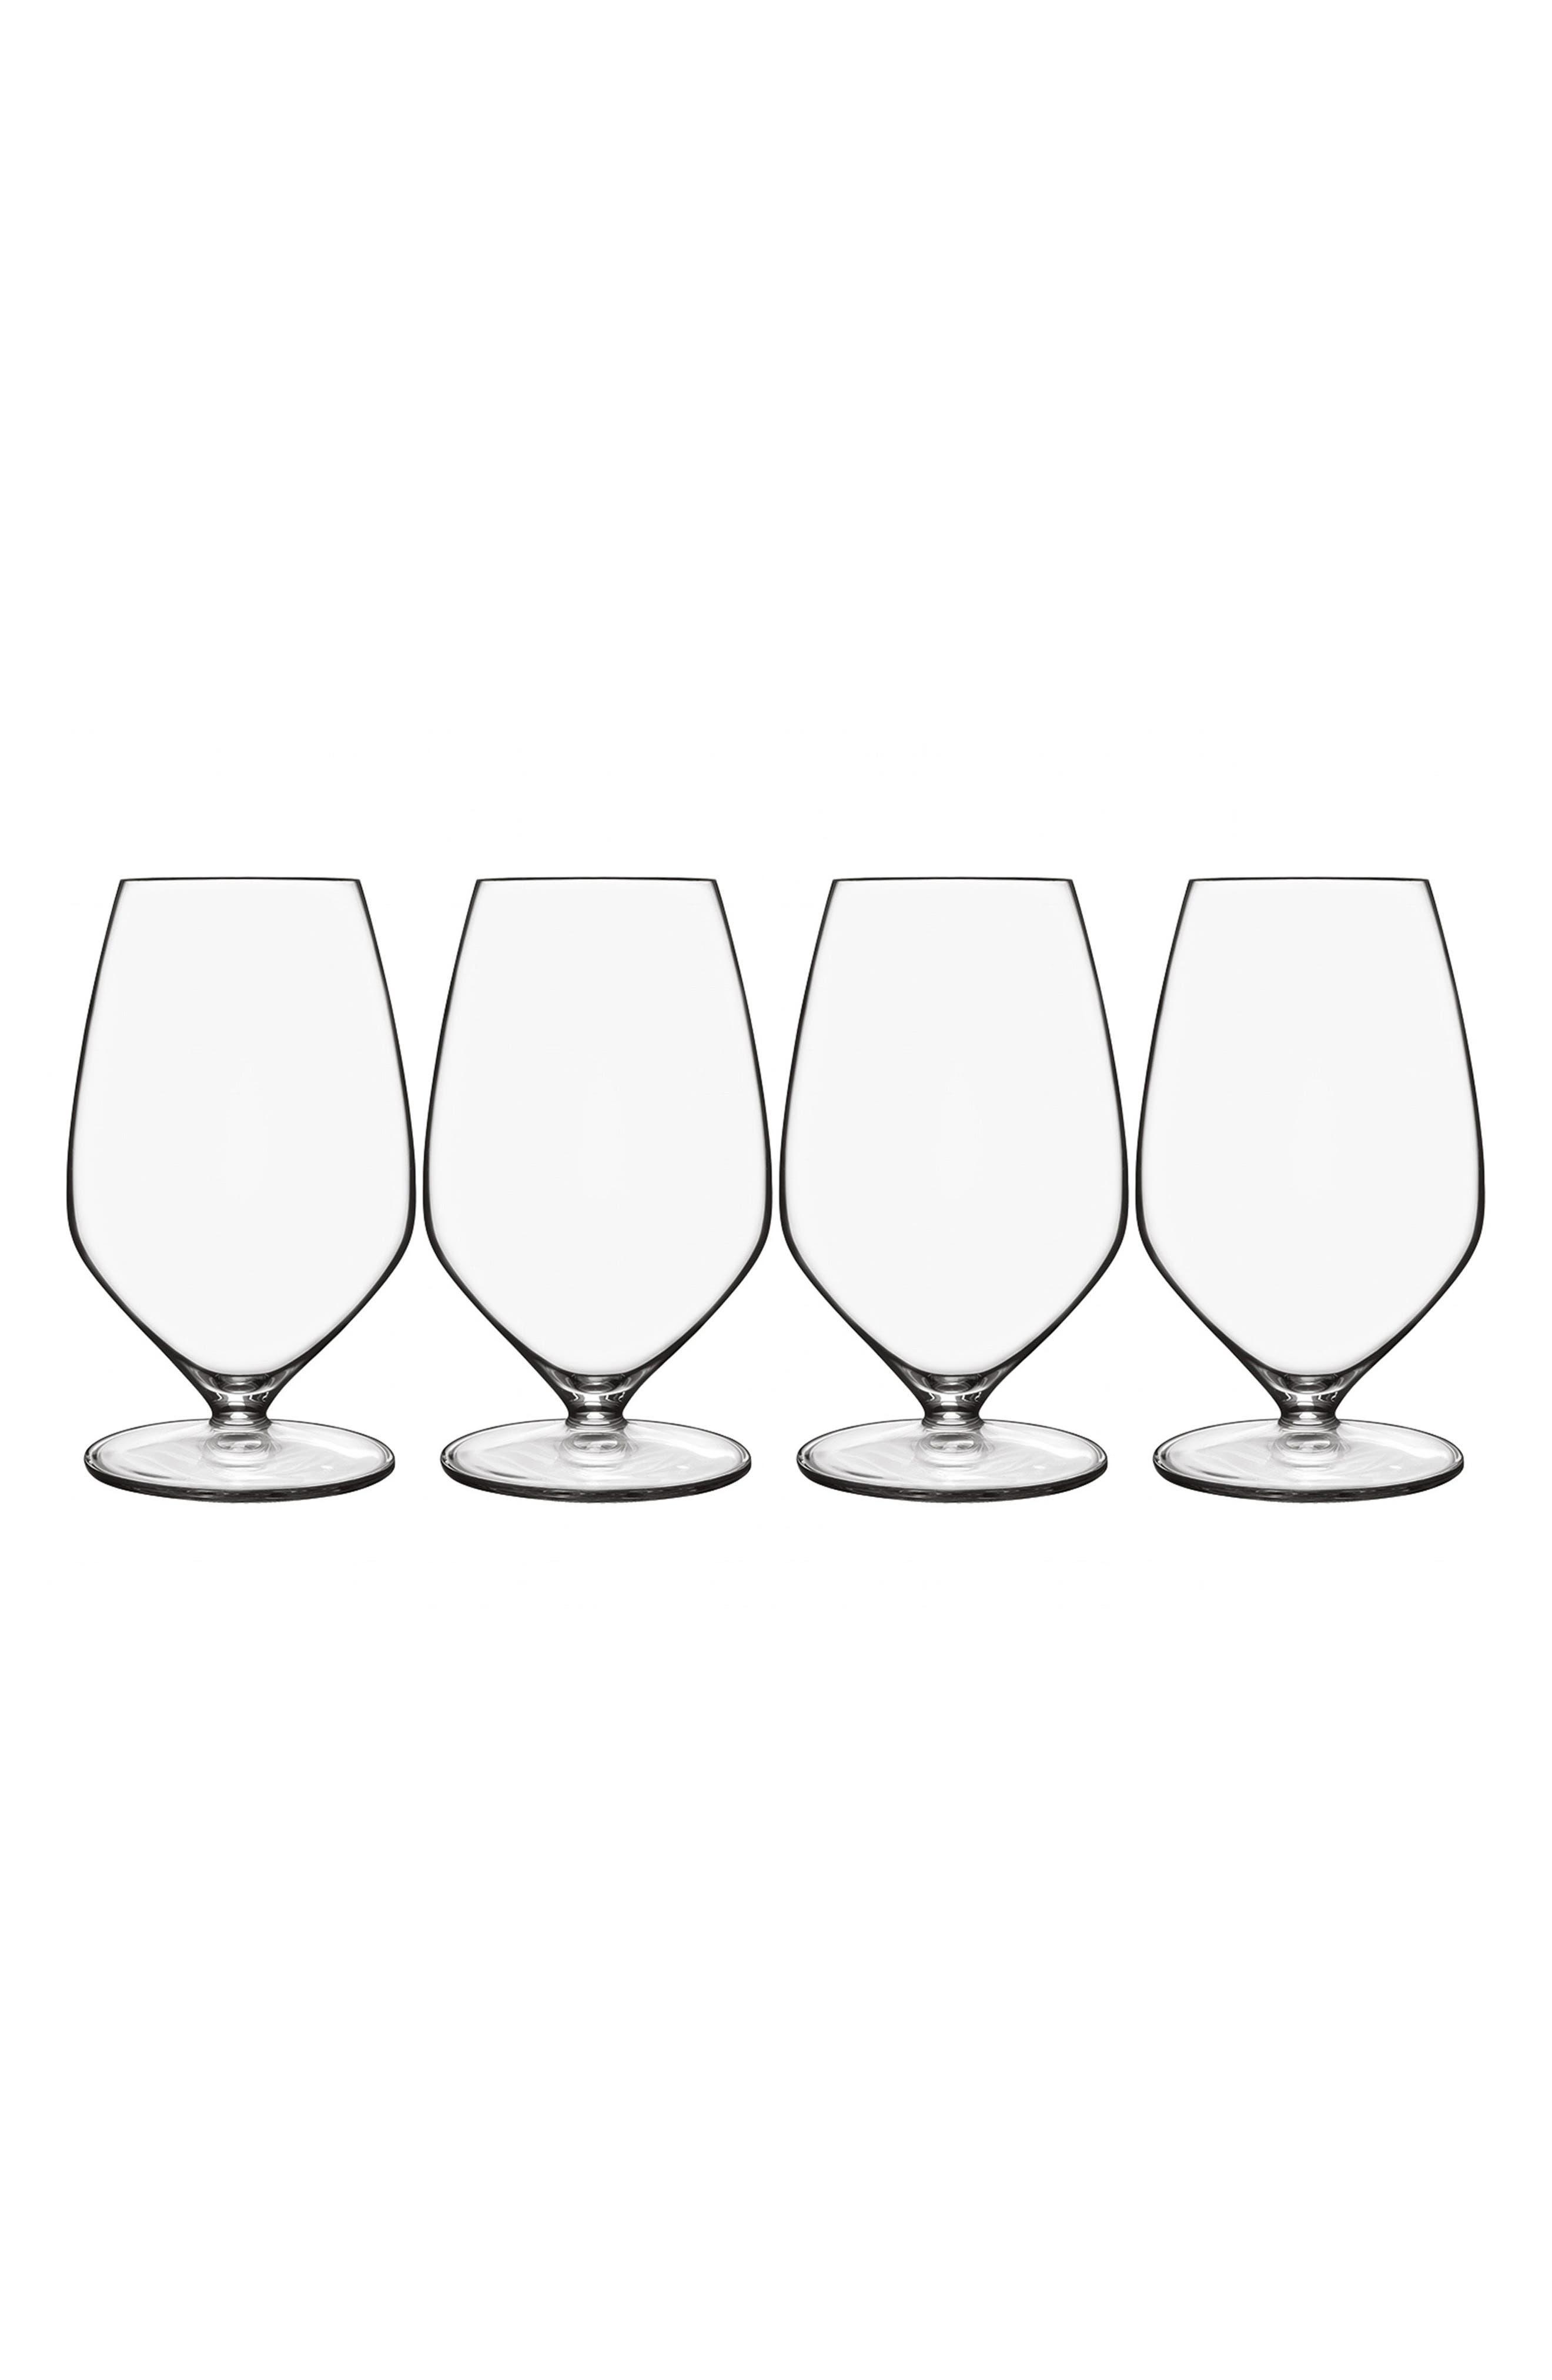 T-Glass Set of 4 Sauvignon Glasses,                         Main,                         color, CLEAR